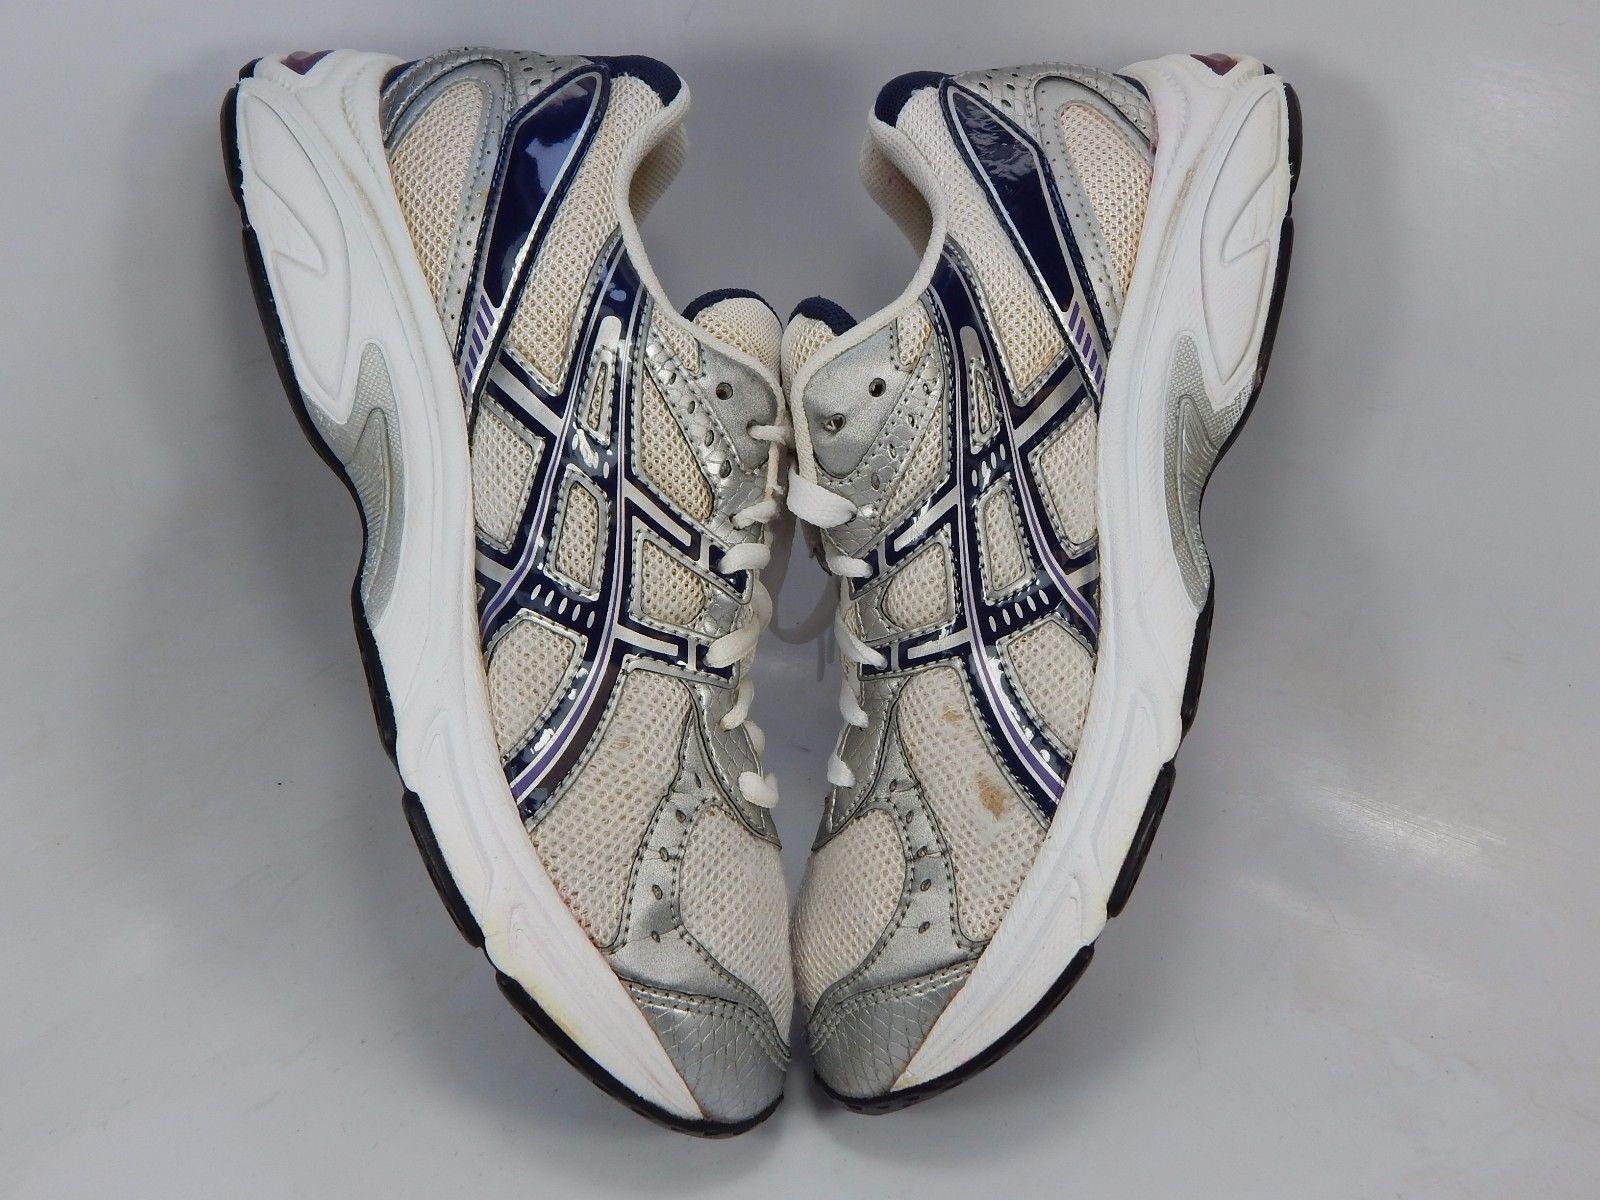 Asics Gel Maverick 3 Women's Running Shoes Size US 8.5 M (B) EU 40 White T077N